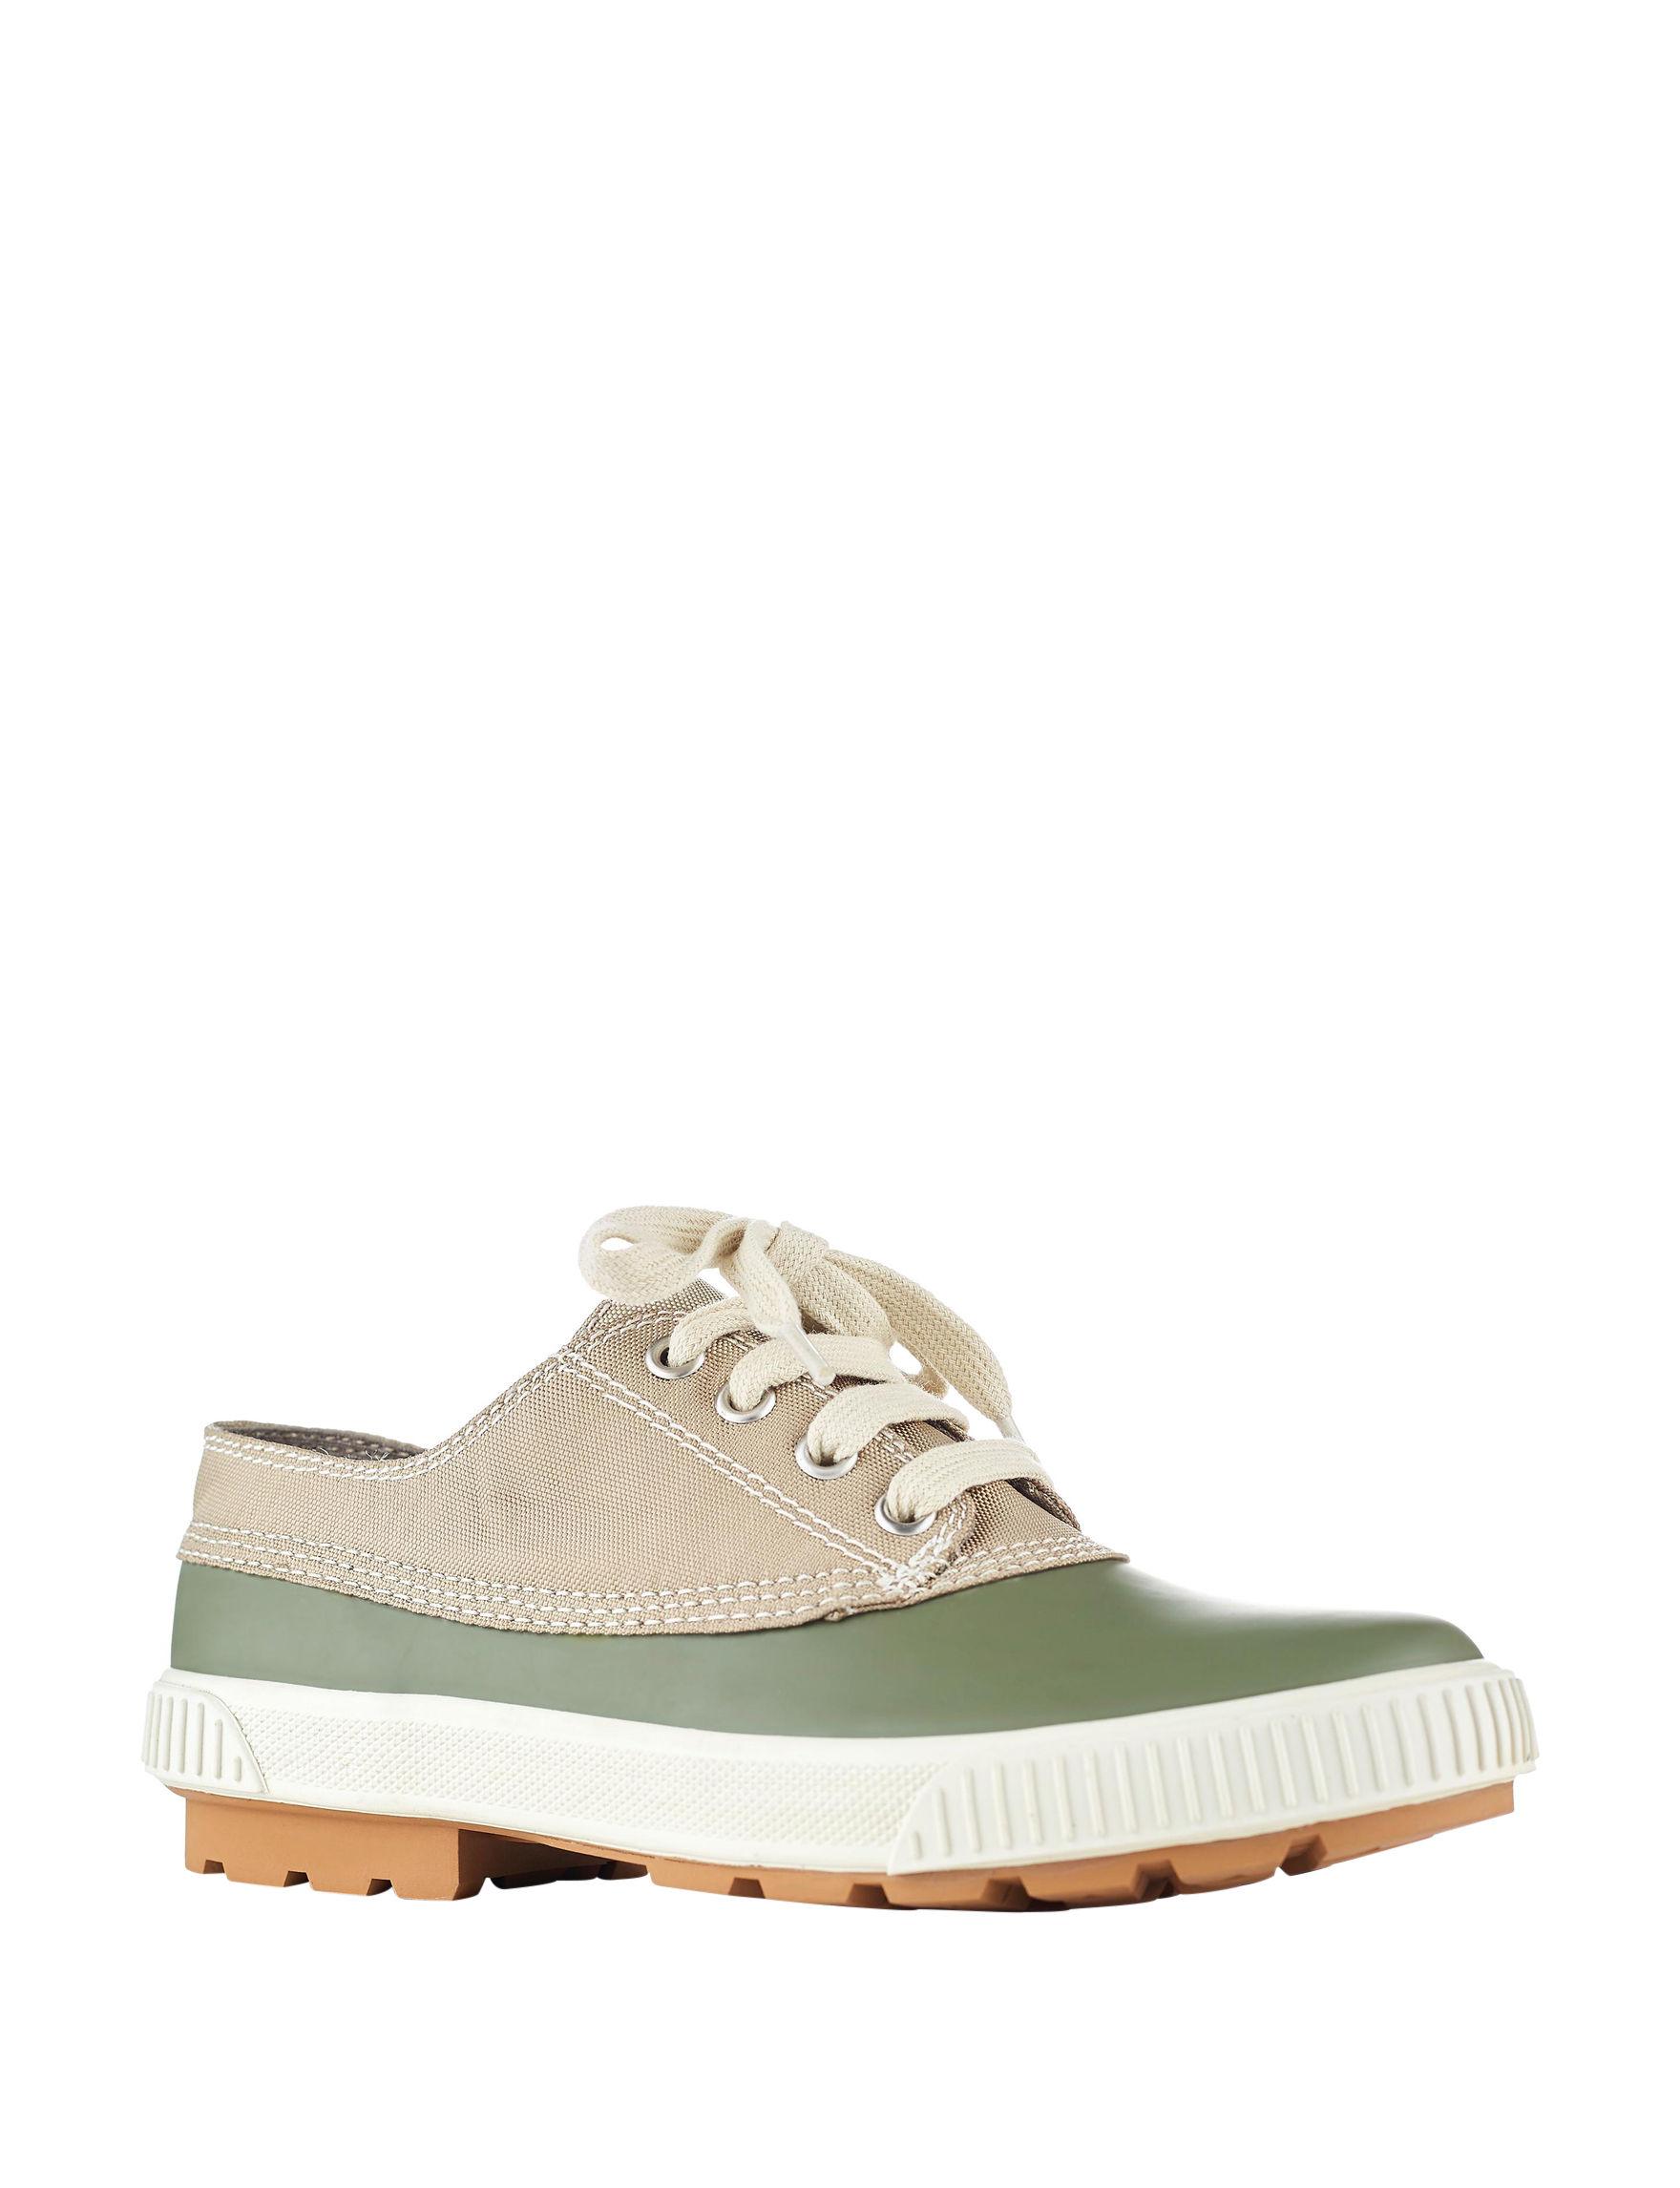 Cougar Green Rain Boots